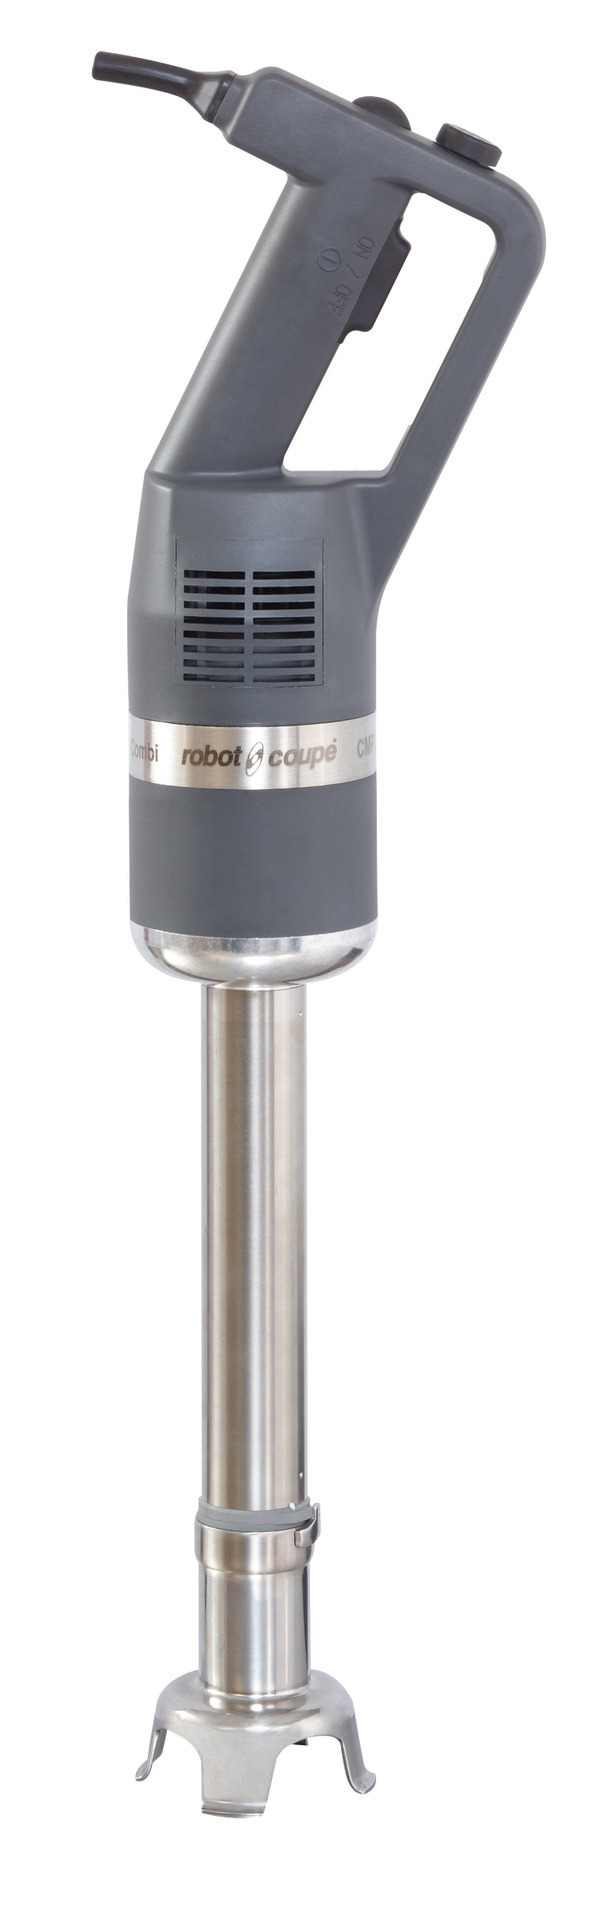 Stabmixer CMP 300 mm / 230 V / 0,35 kW